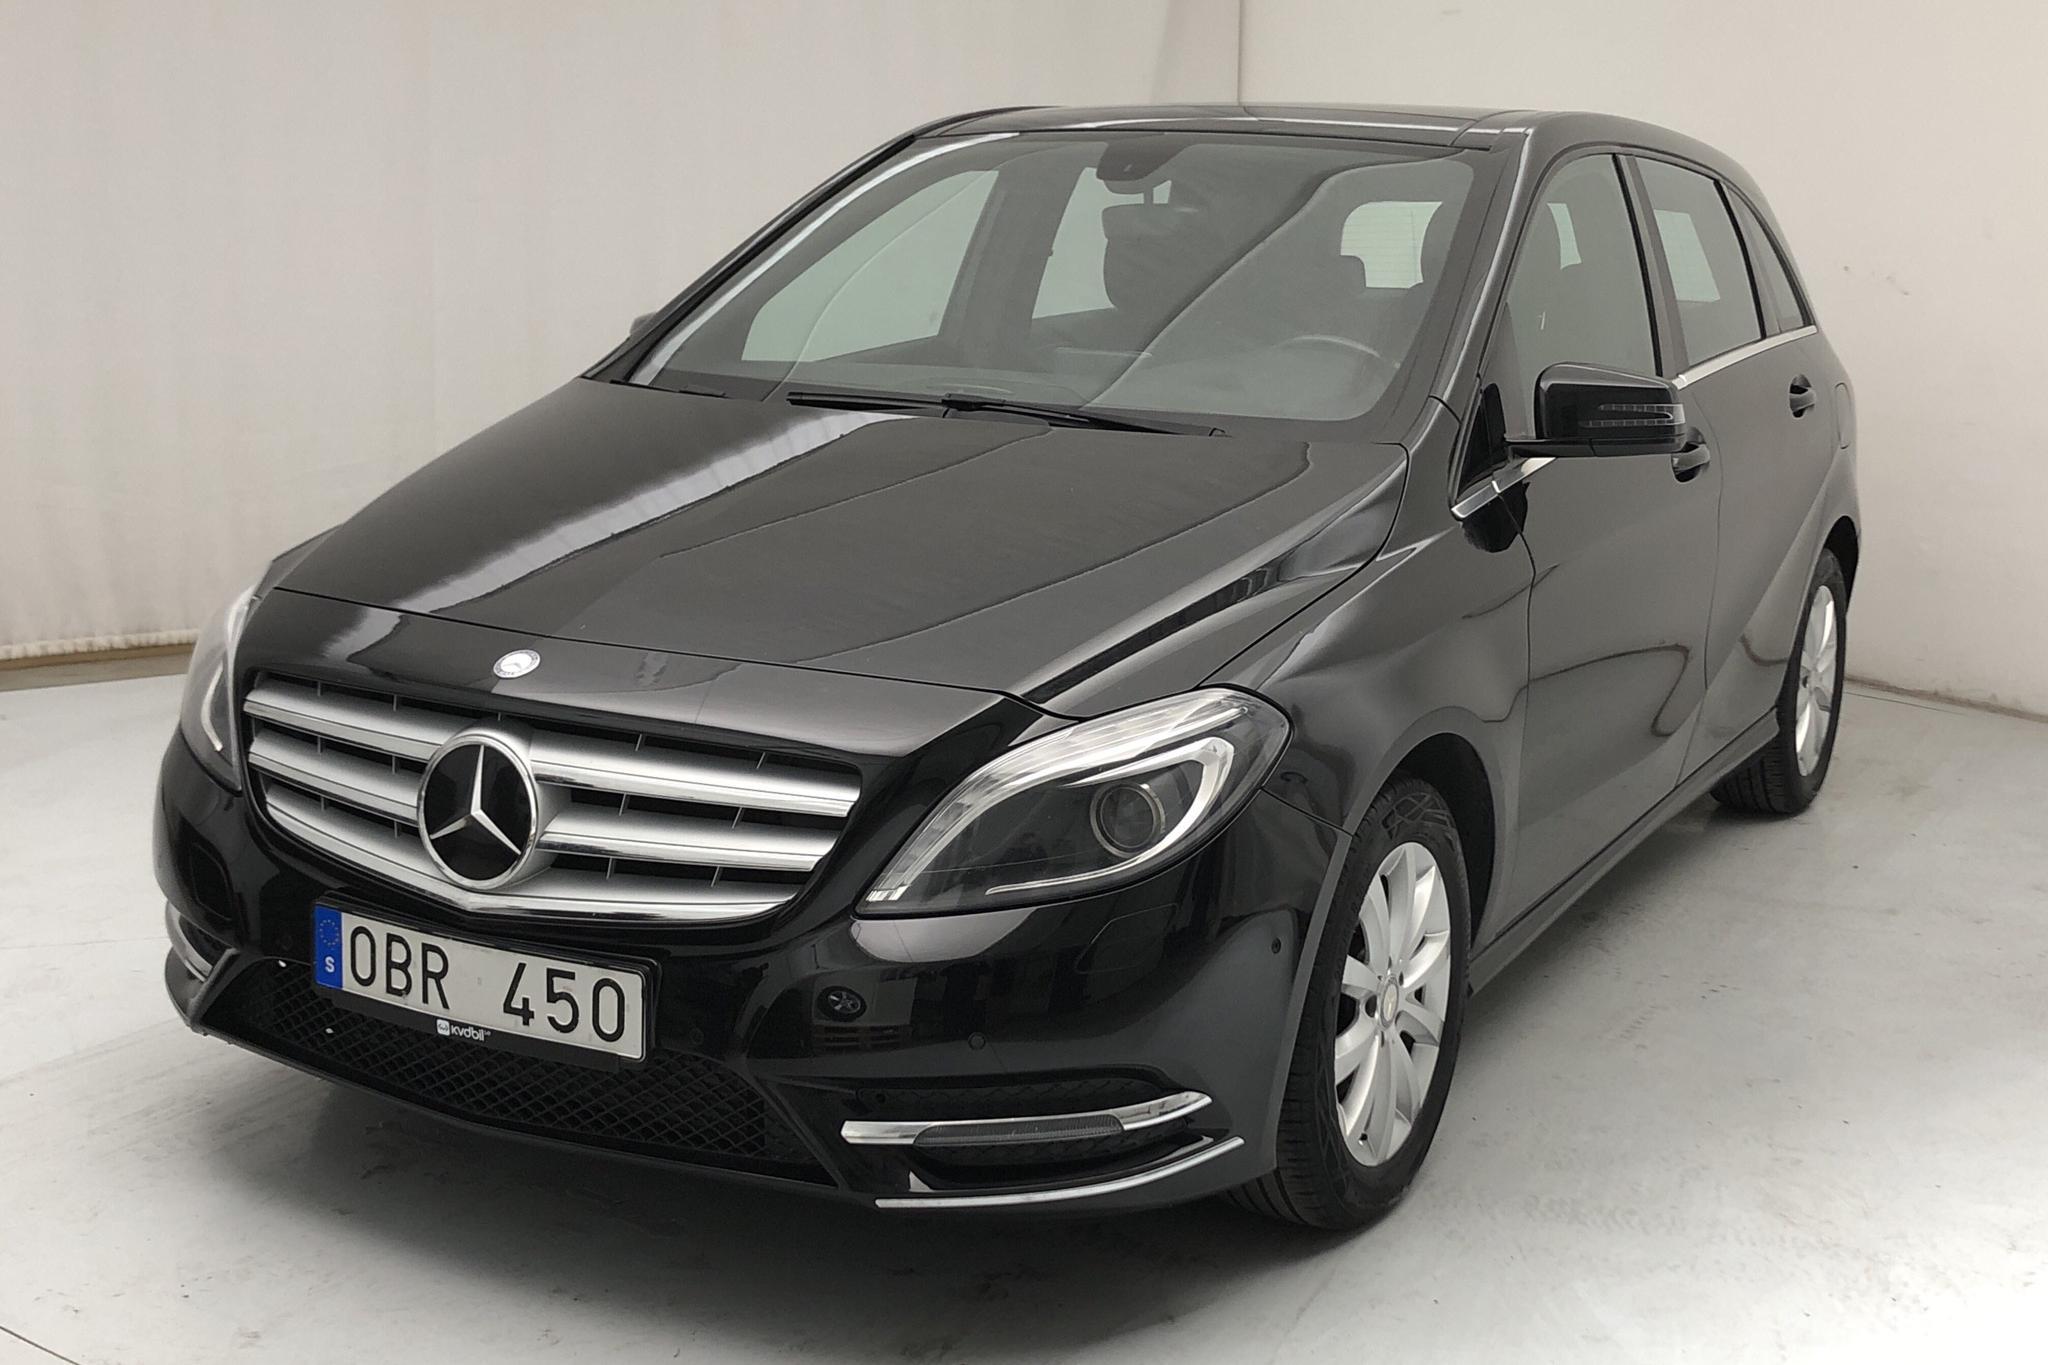 Mercedes B 180 CDI W246 (109hk) - 202 030 km - Automatic - black - 2014